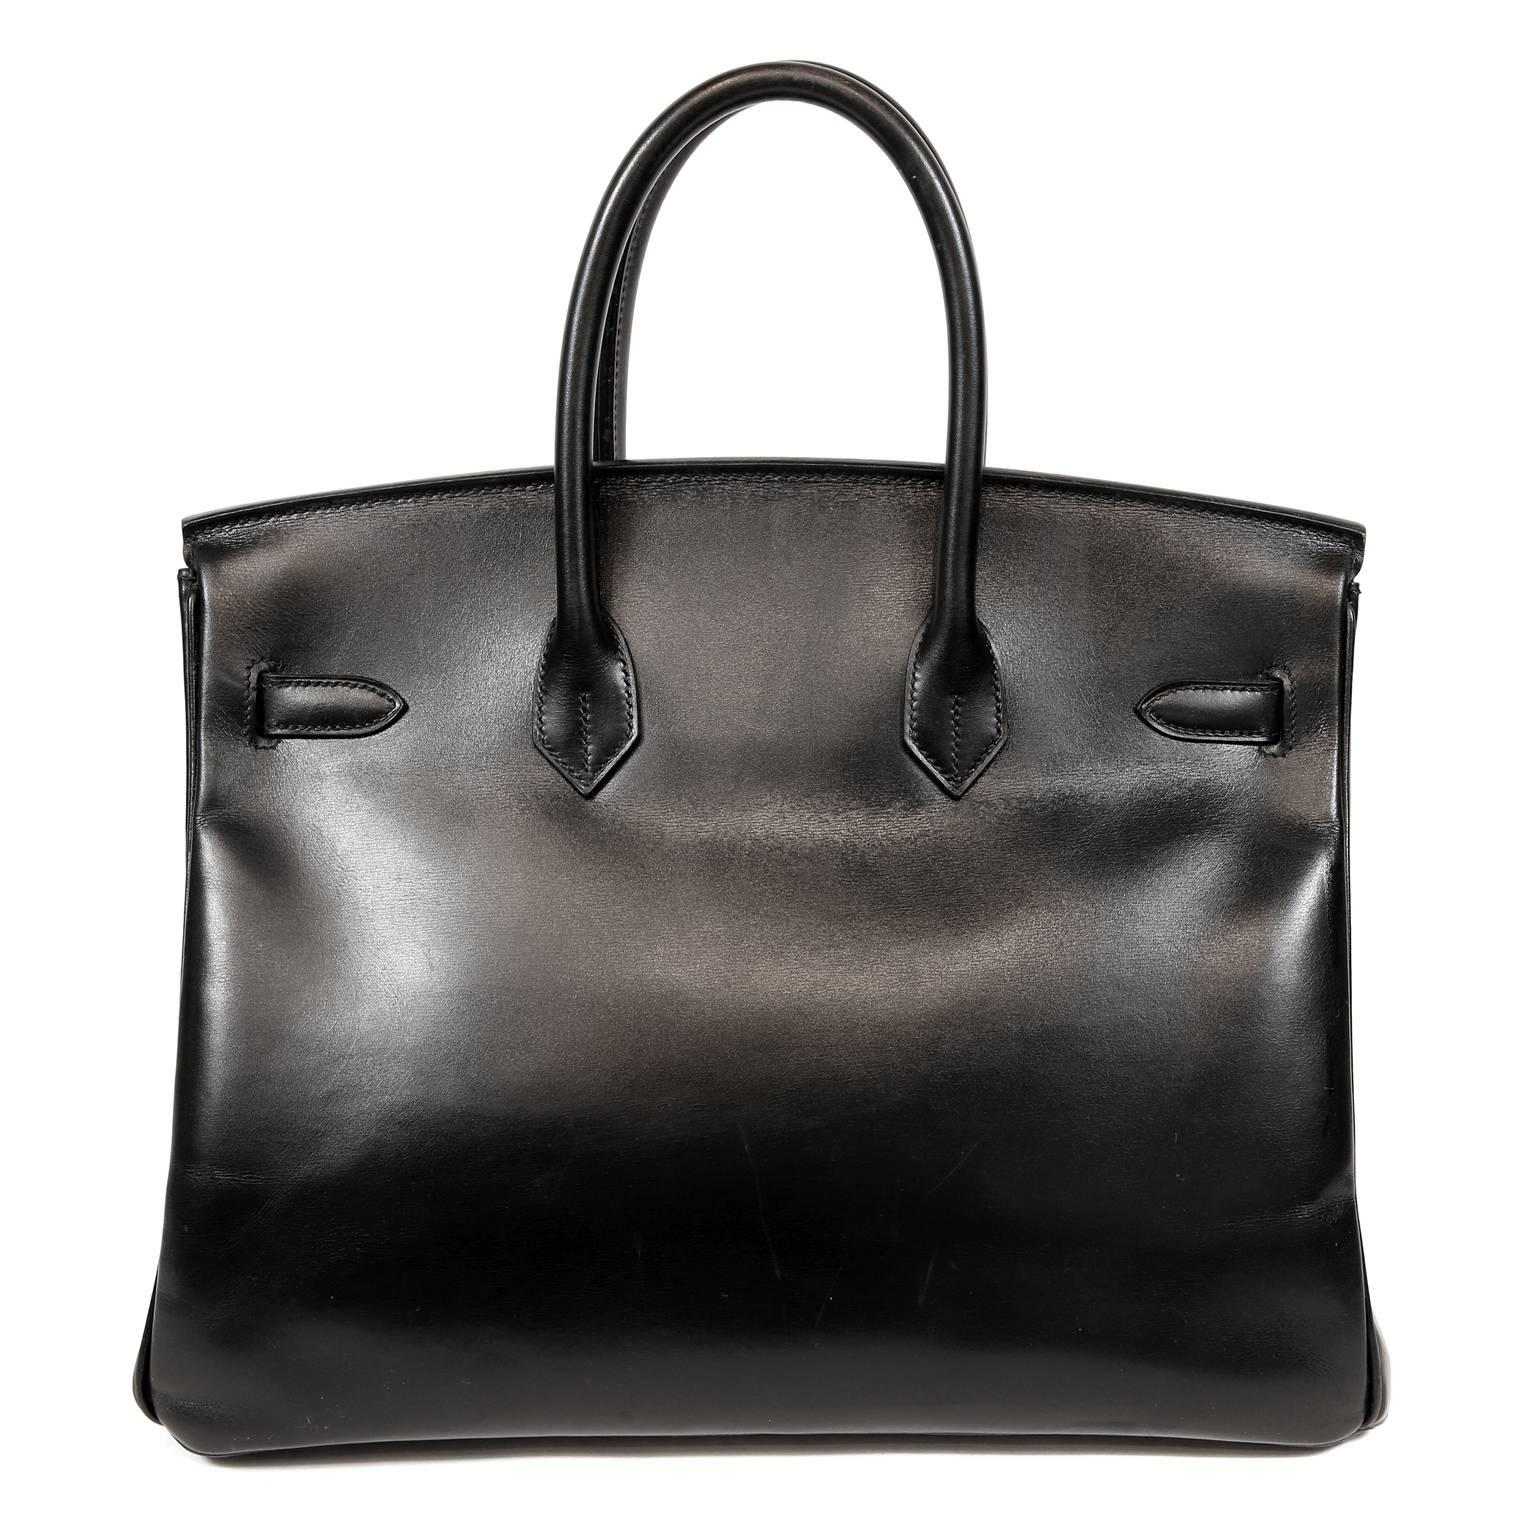 Hermès Black Box Calf 35 cm Birkin Bag with Palladium Hardware at 1stdibs dc6972f326d3b